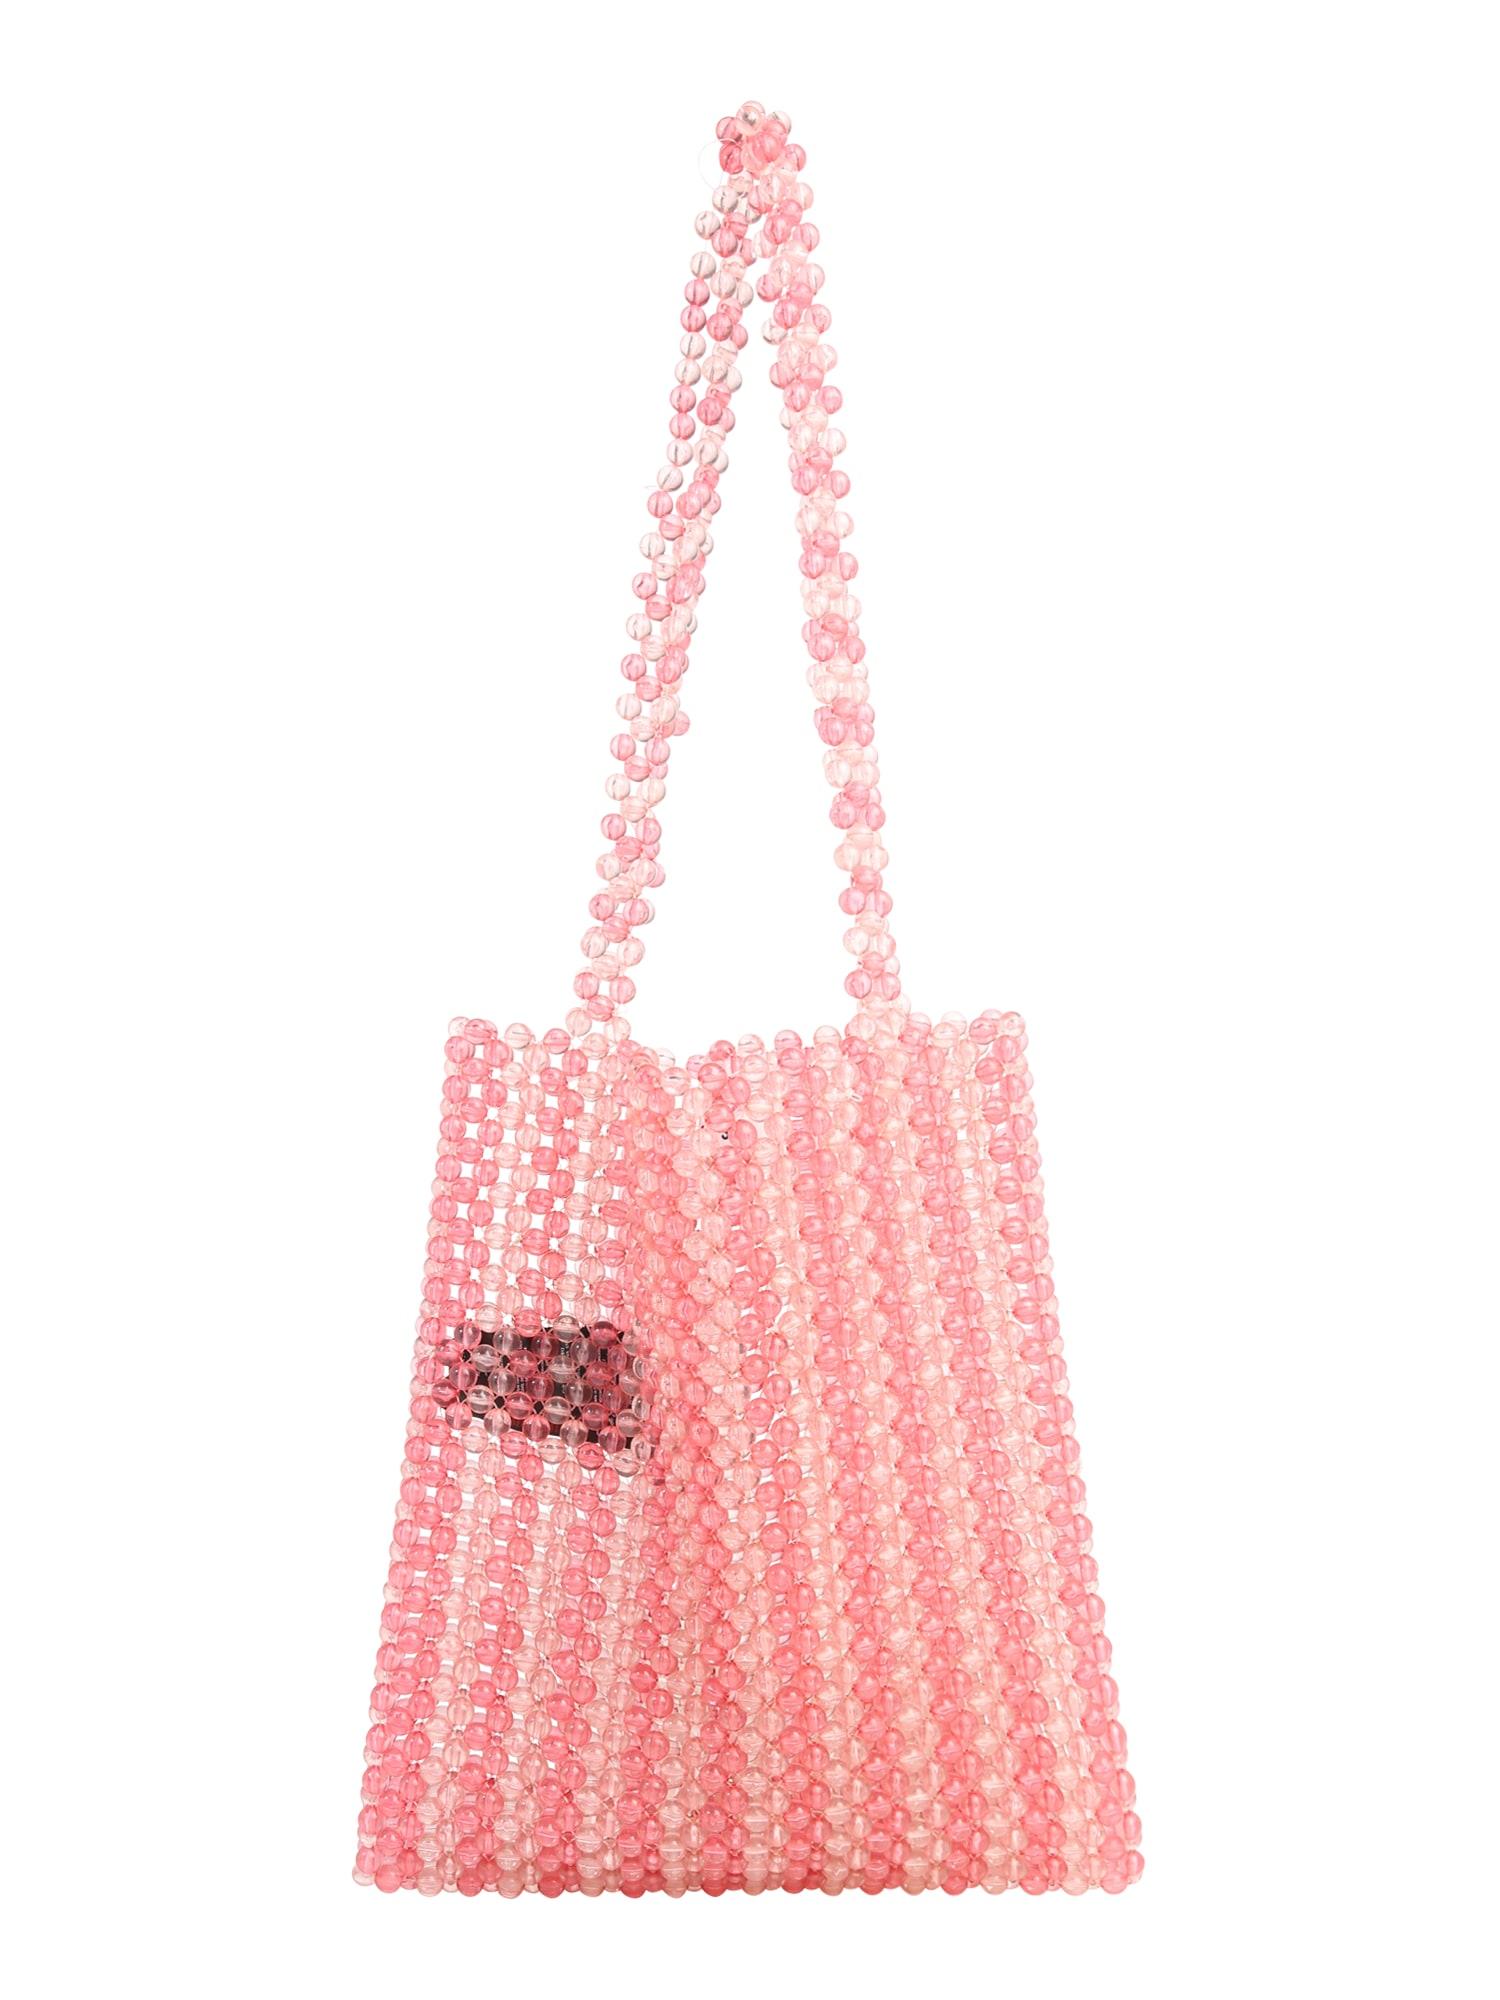 Taška přes rameno JEARL pink PIECES